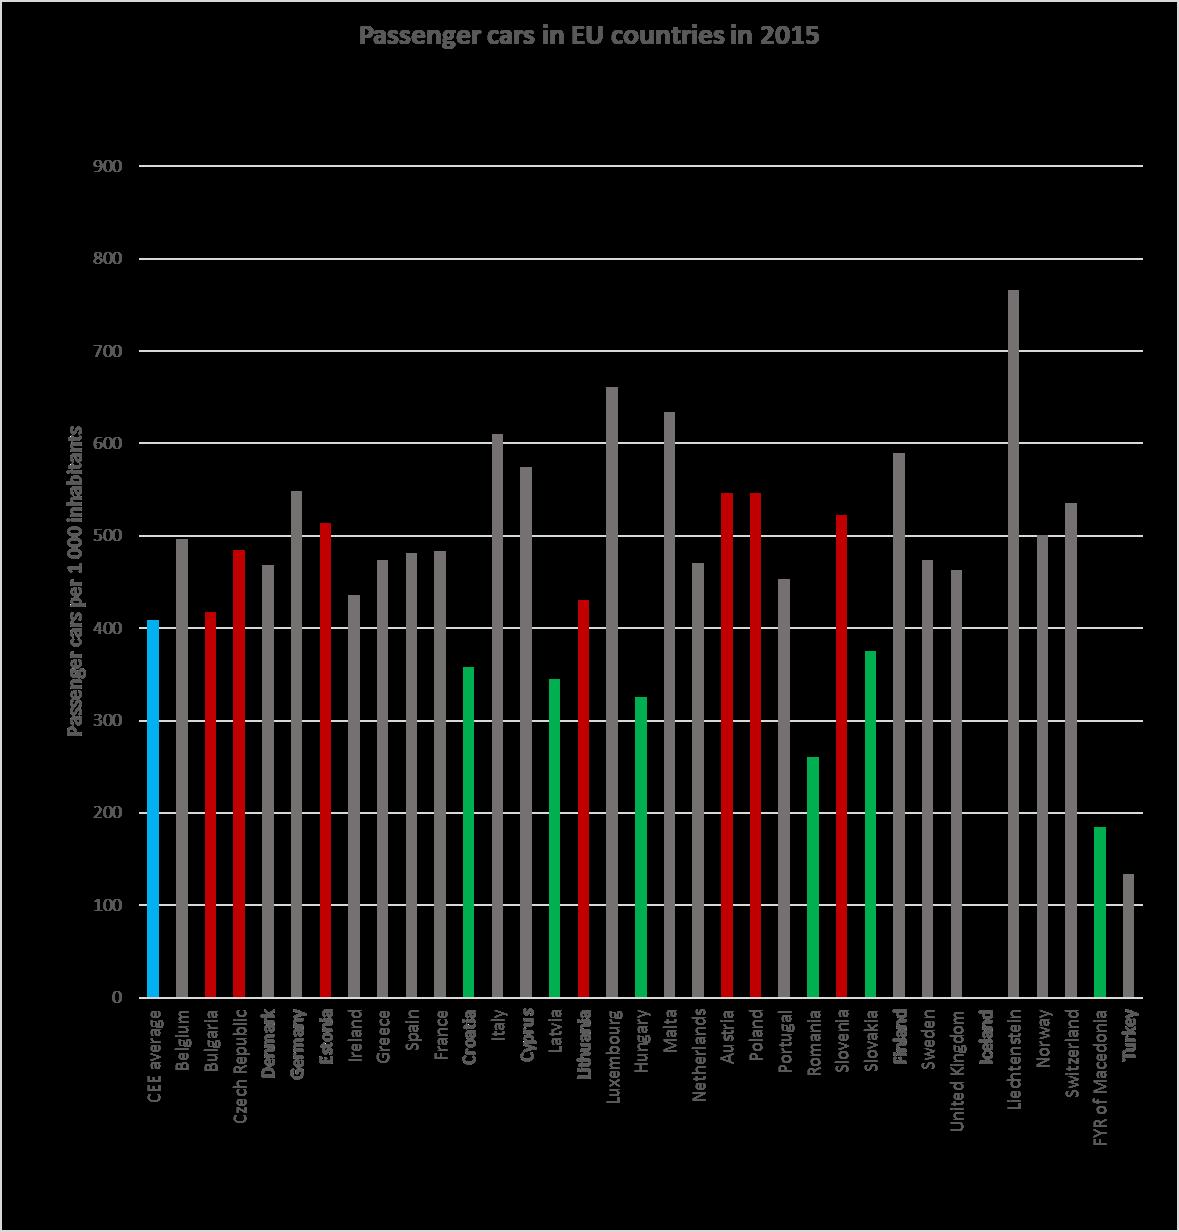 eu-passenger-cars-2015